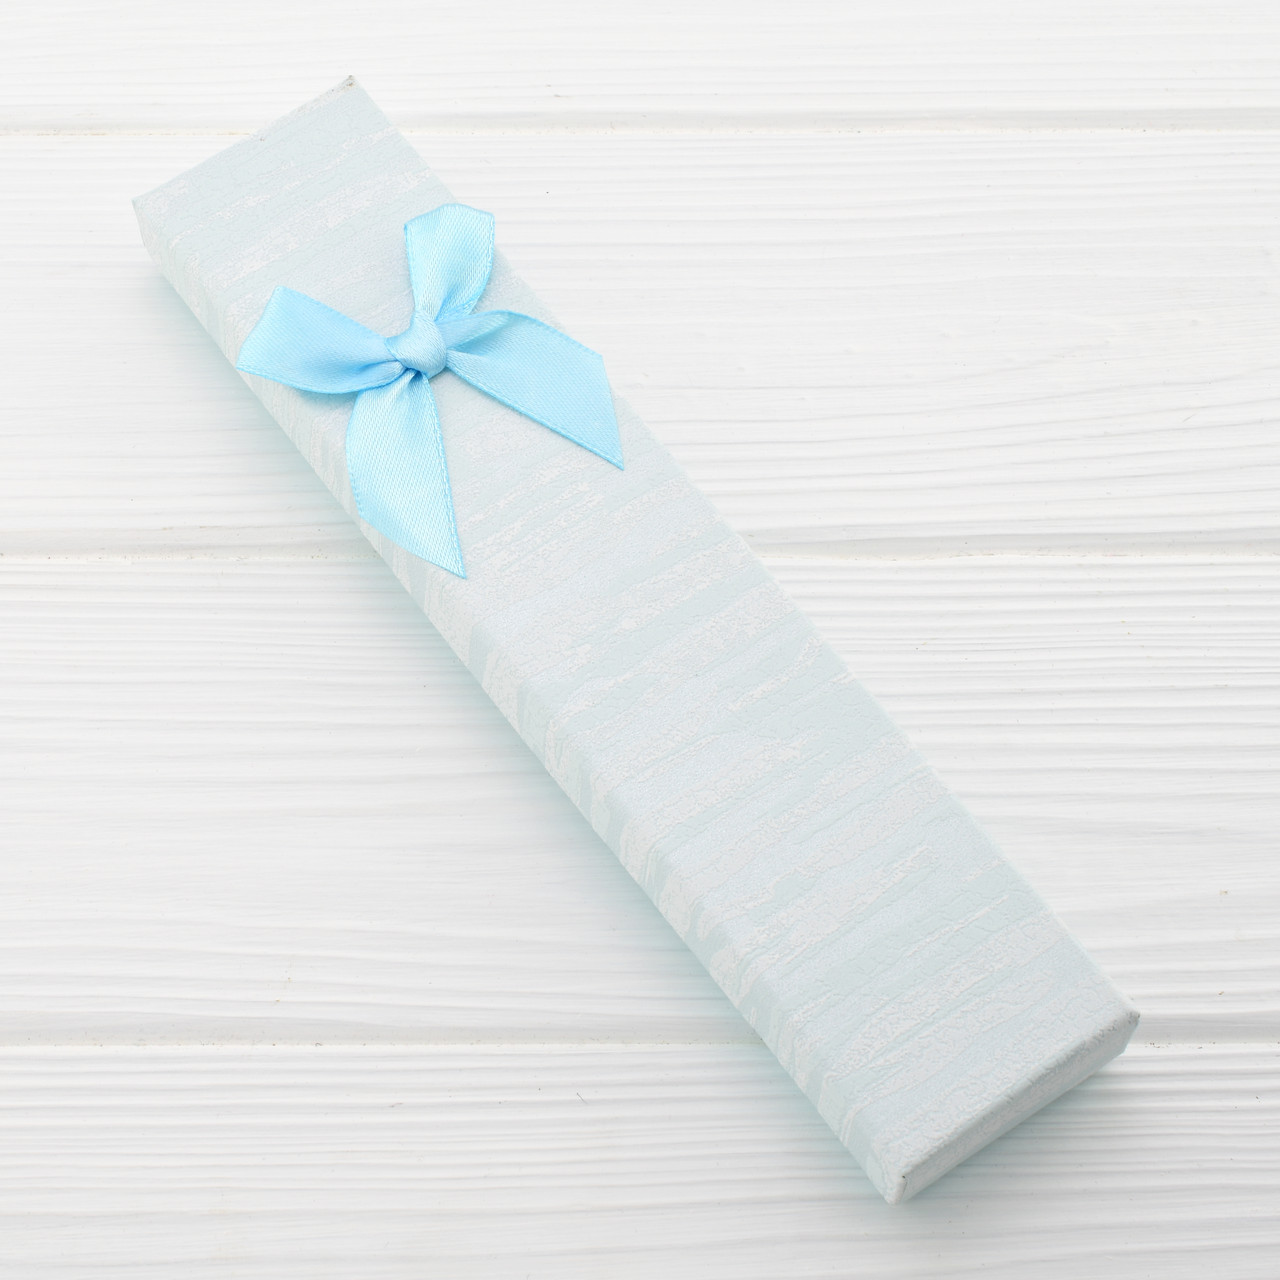 Футляр светло голубой 741230 для цепочек браслетов размер 21х4 см